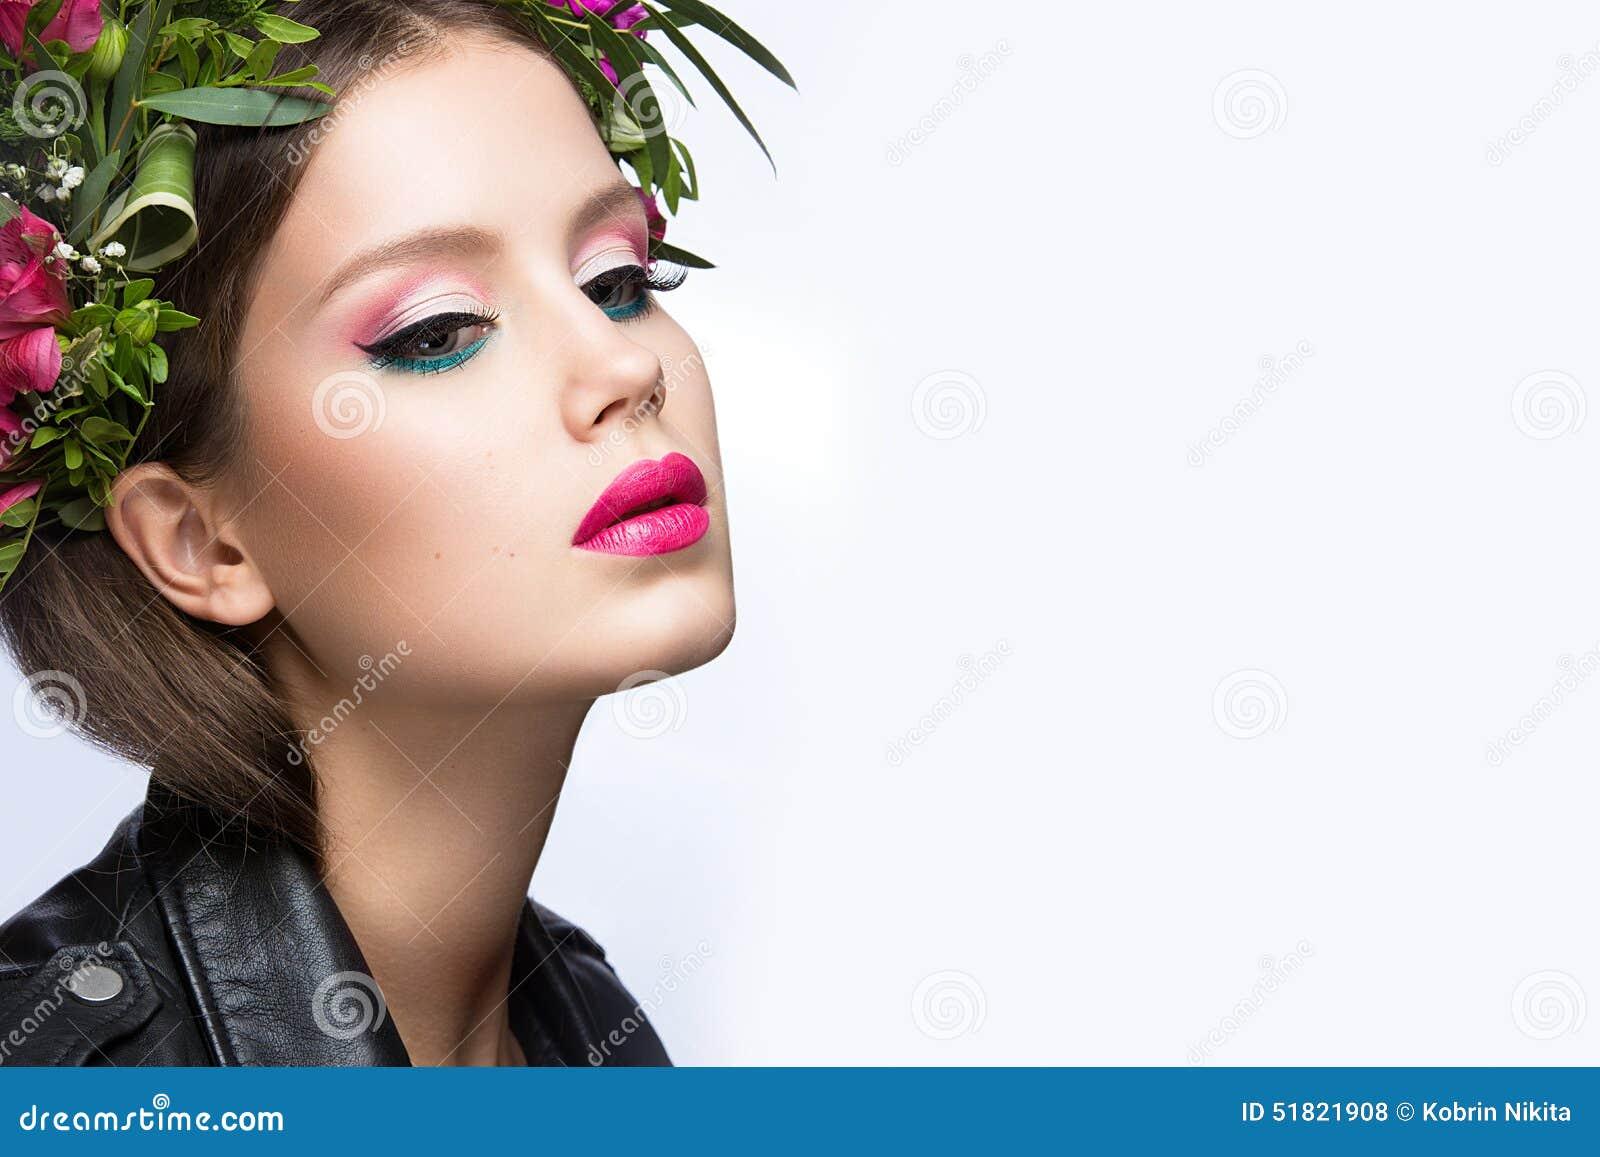 beauty girl face make - photo #23